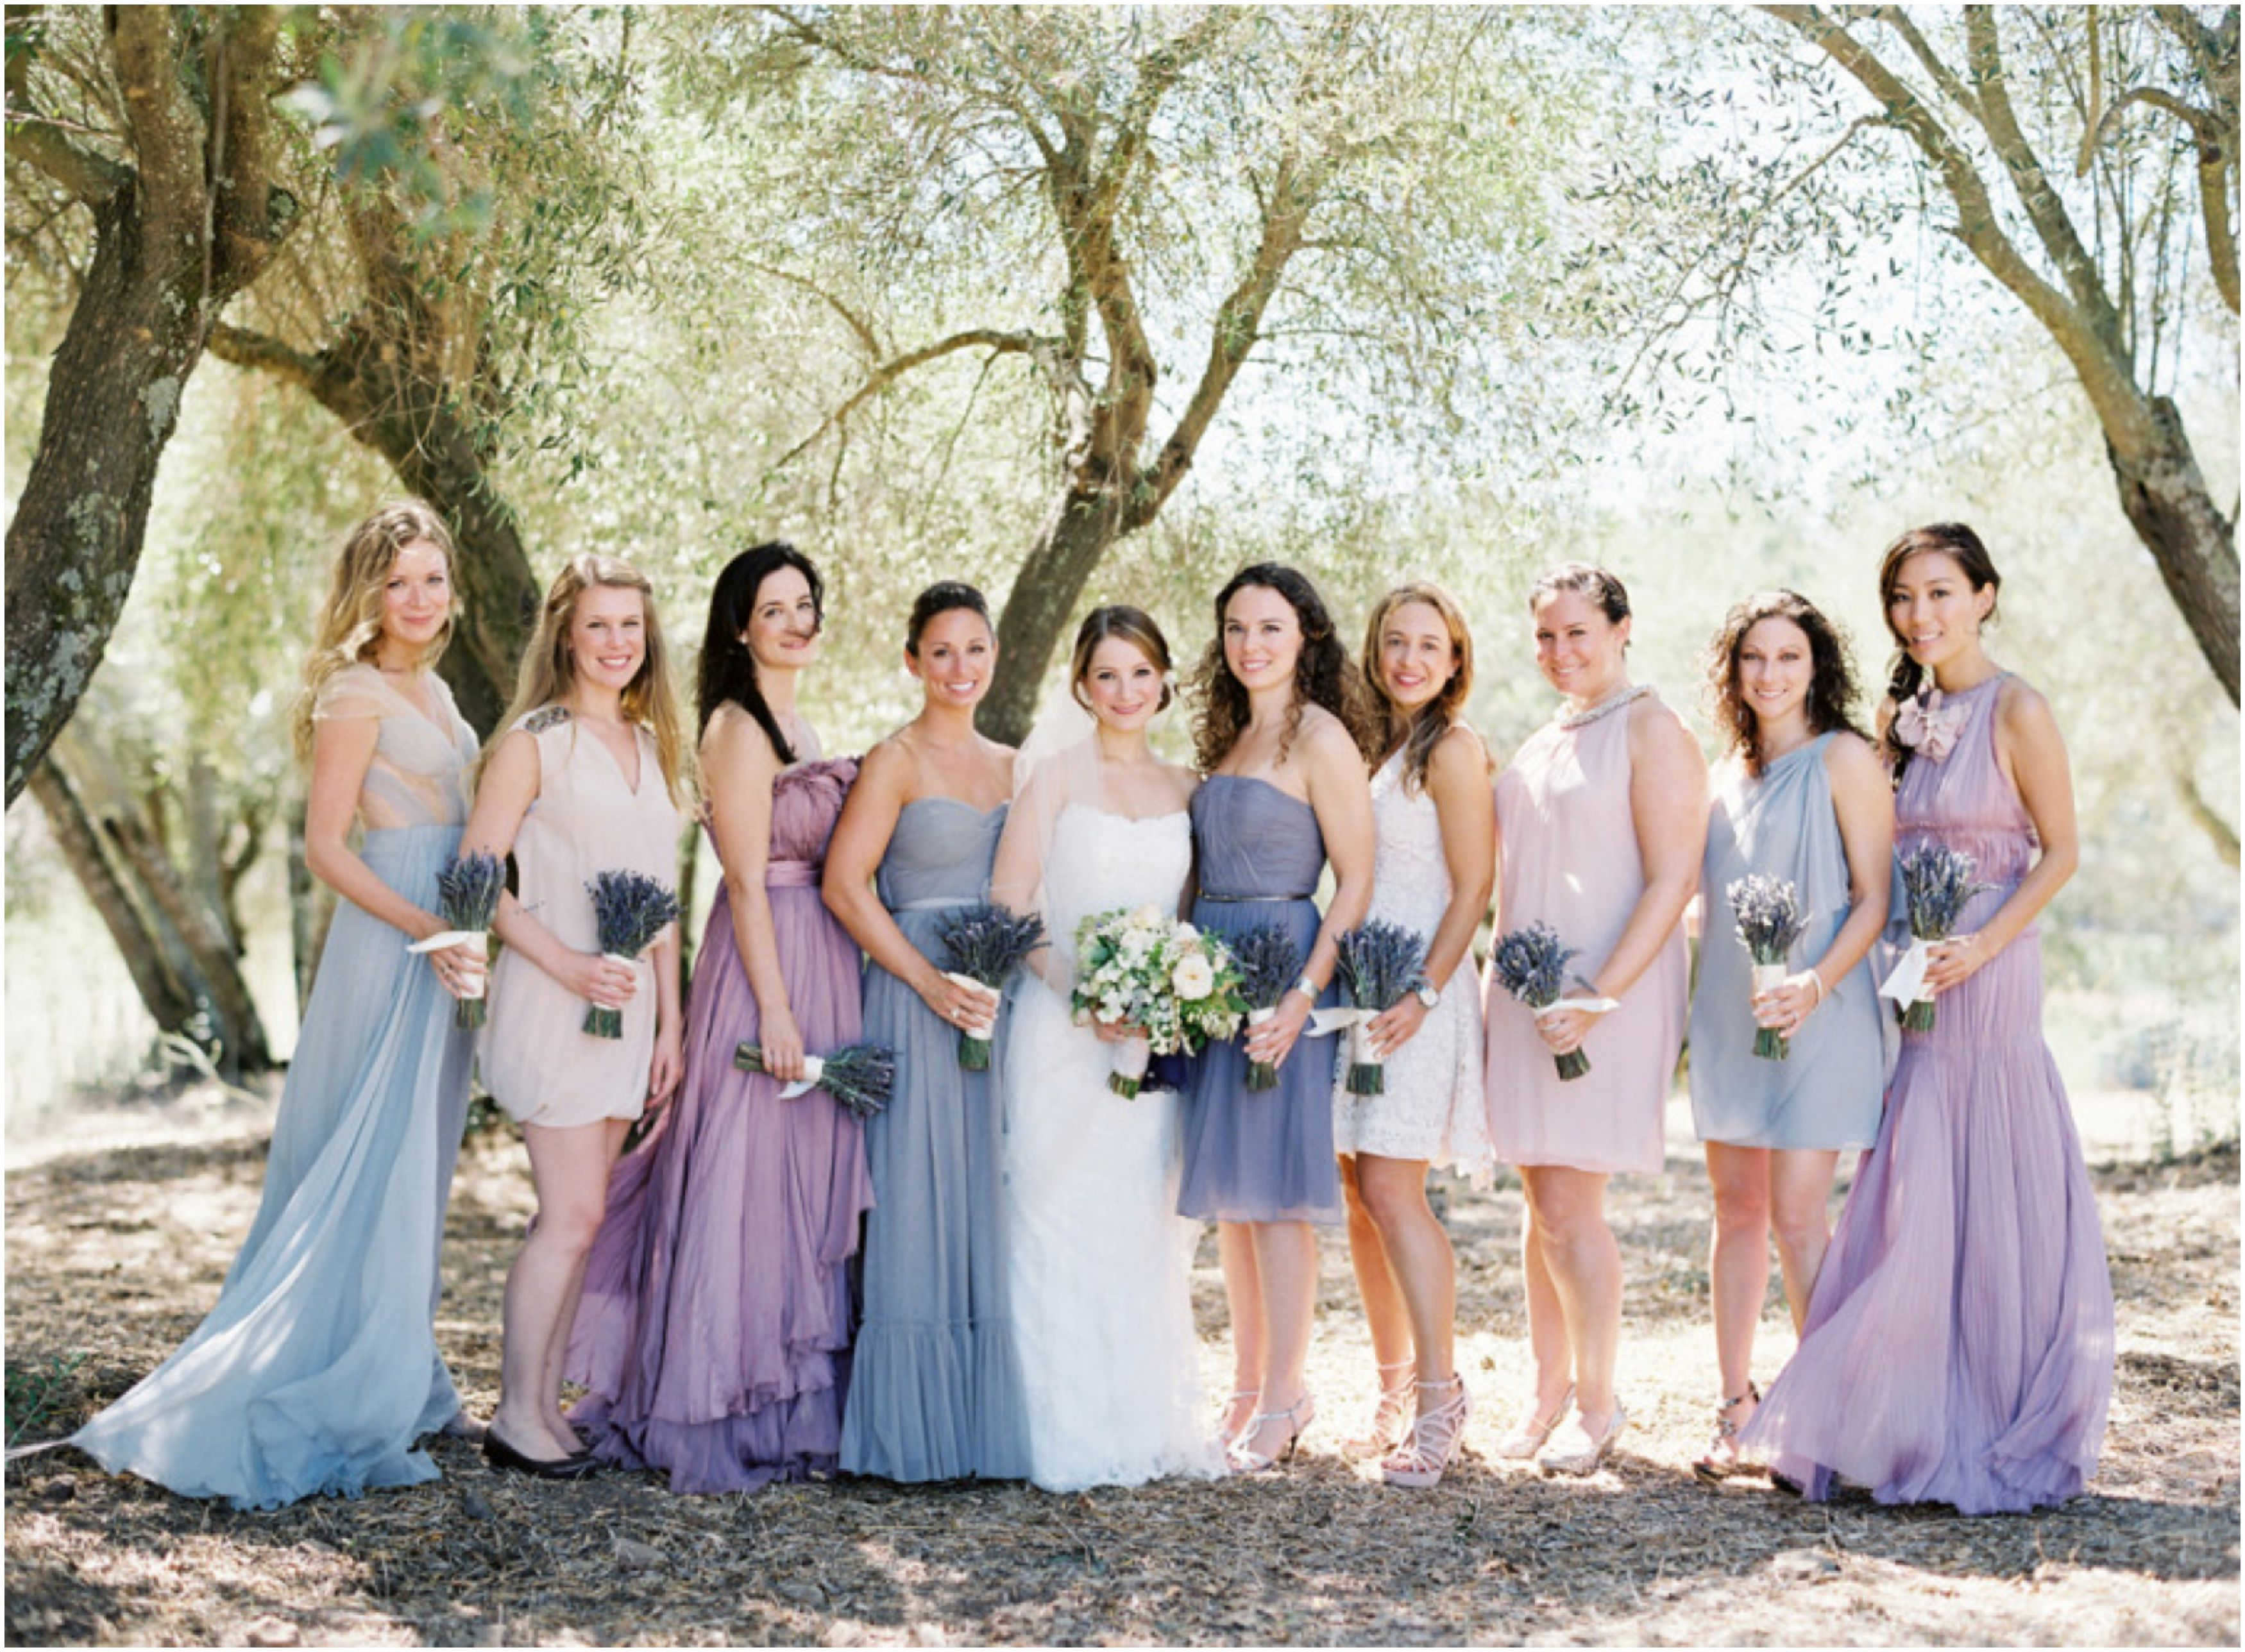 Elegant outdoor wedding in kenwood california lavender elegant outdoor wedding in kenwood california ombrellifo Image collections